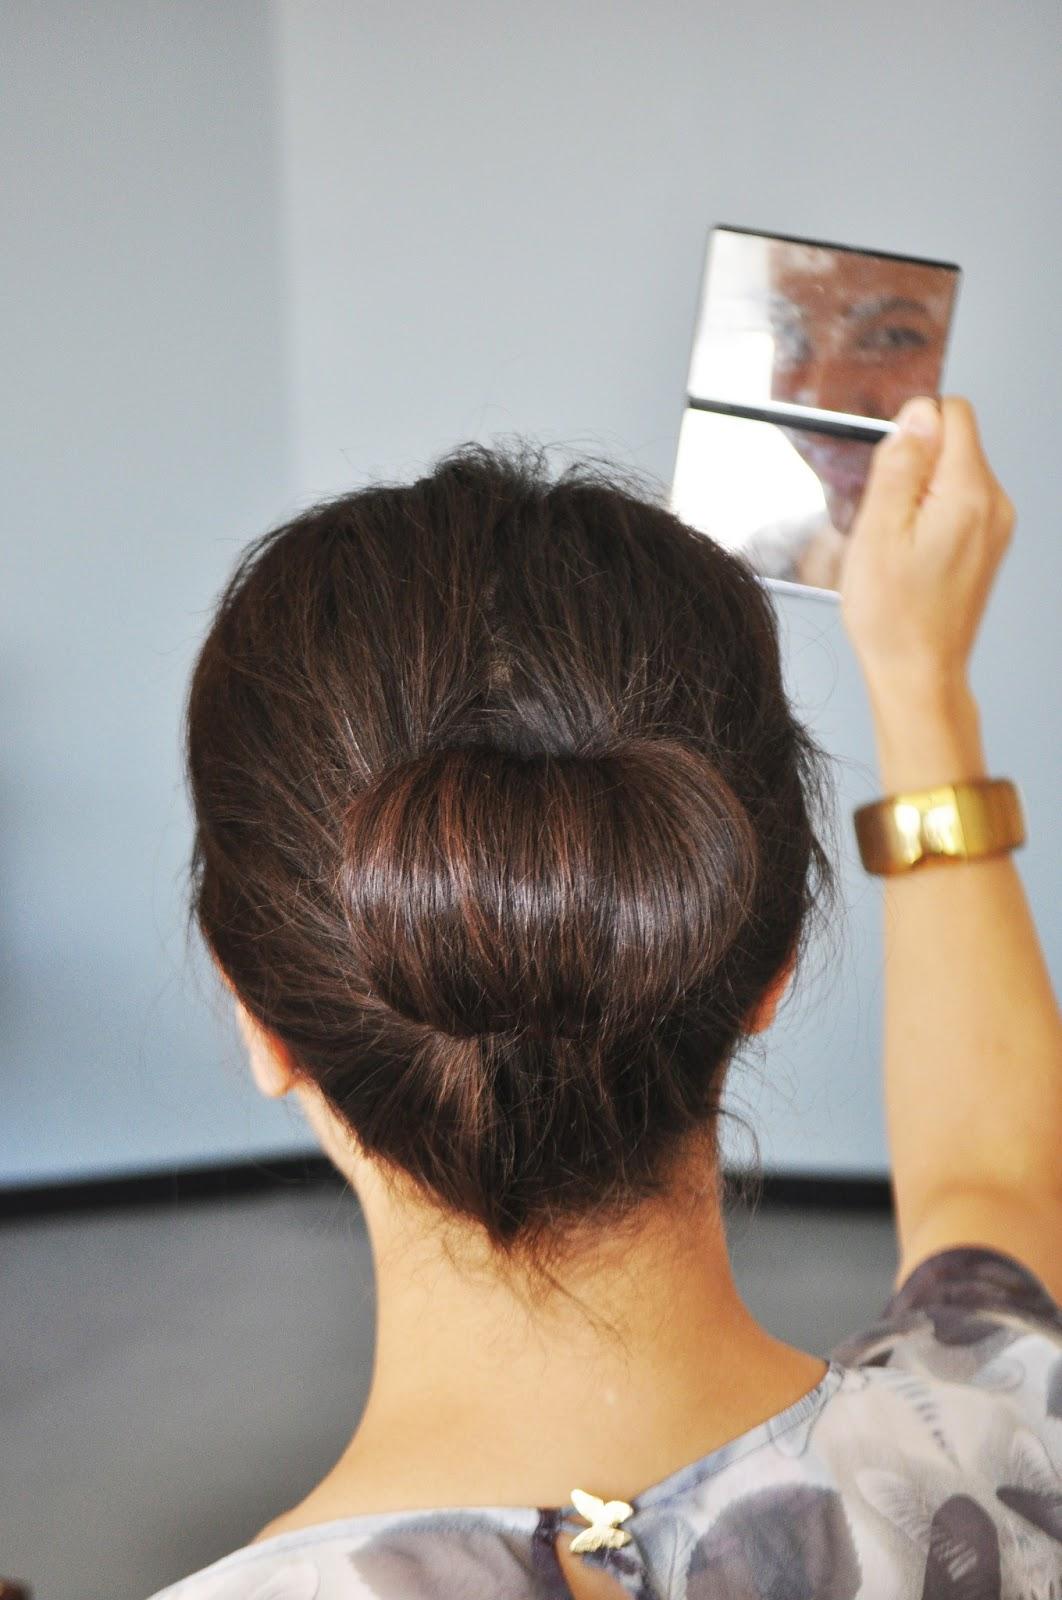 Hair + DIY Tutorials: Shoulder Length